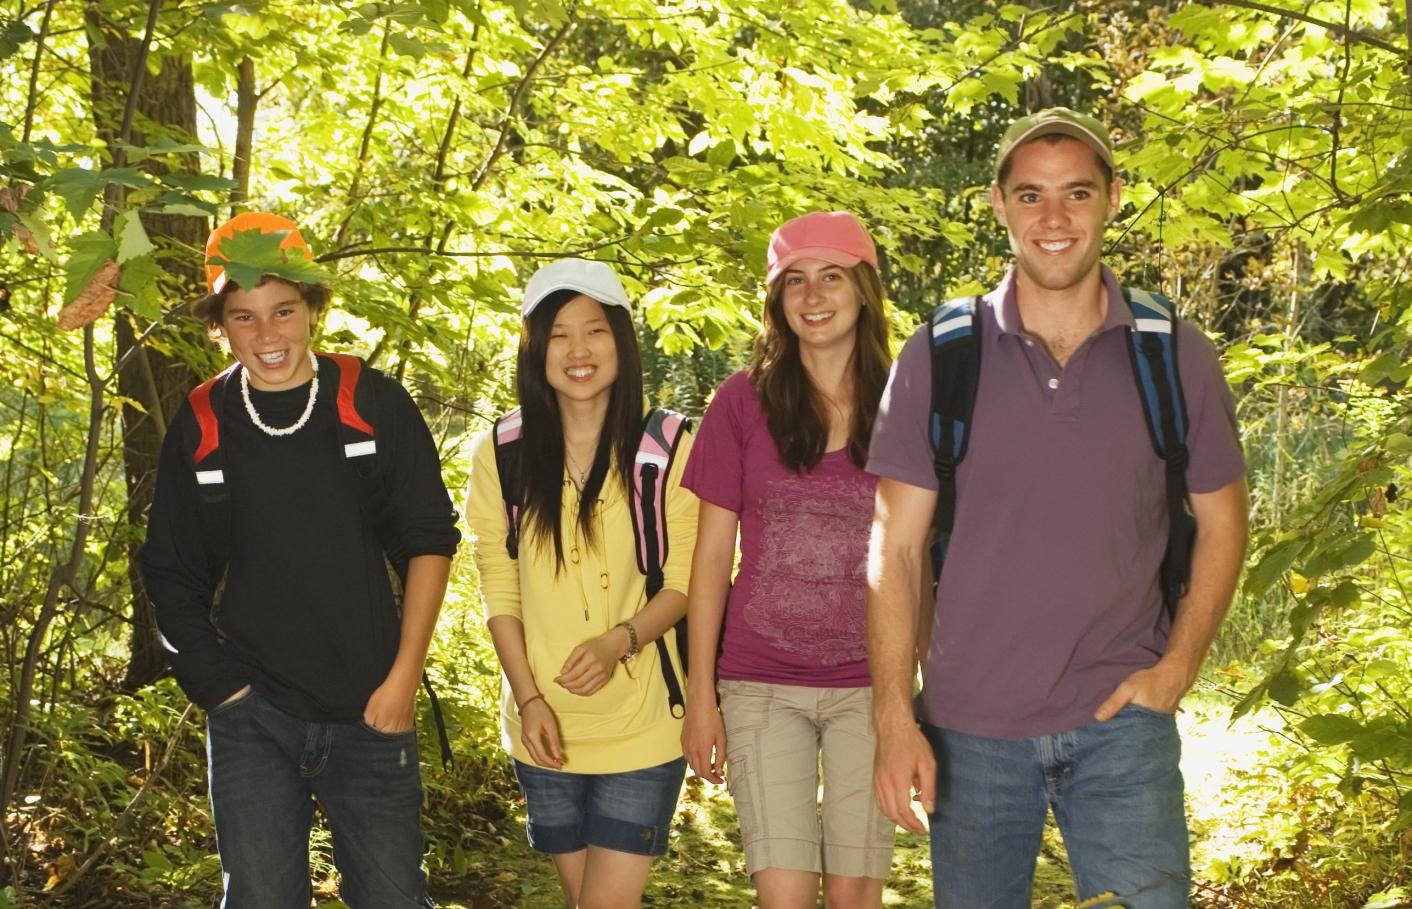 Teenagers hiking through sunny trees